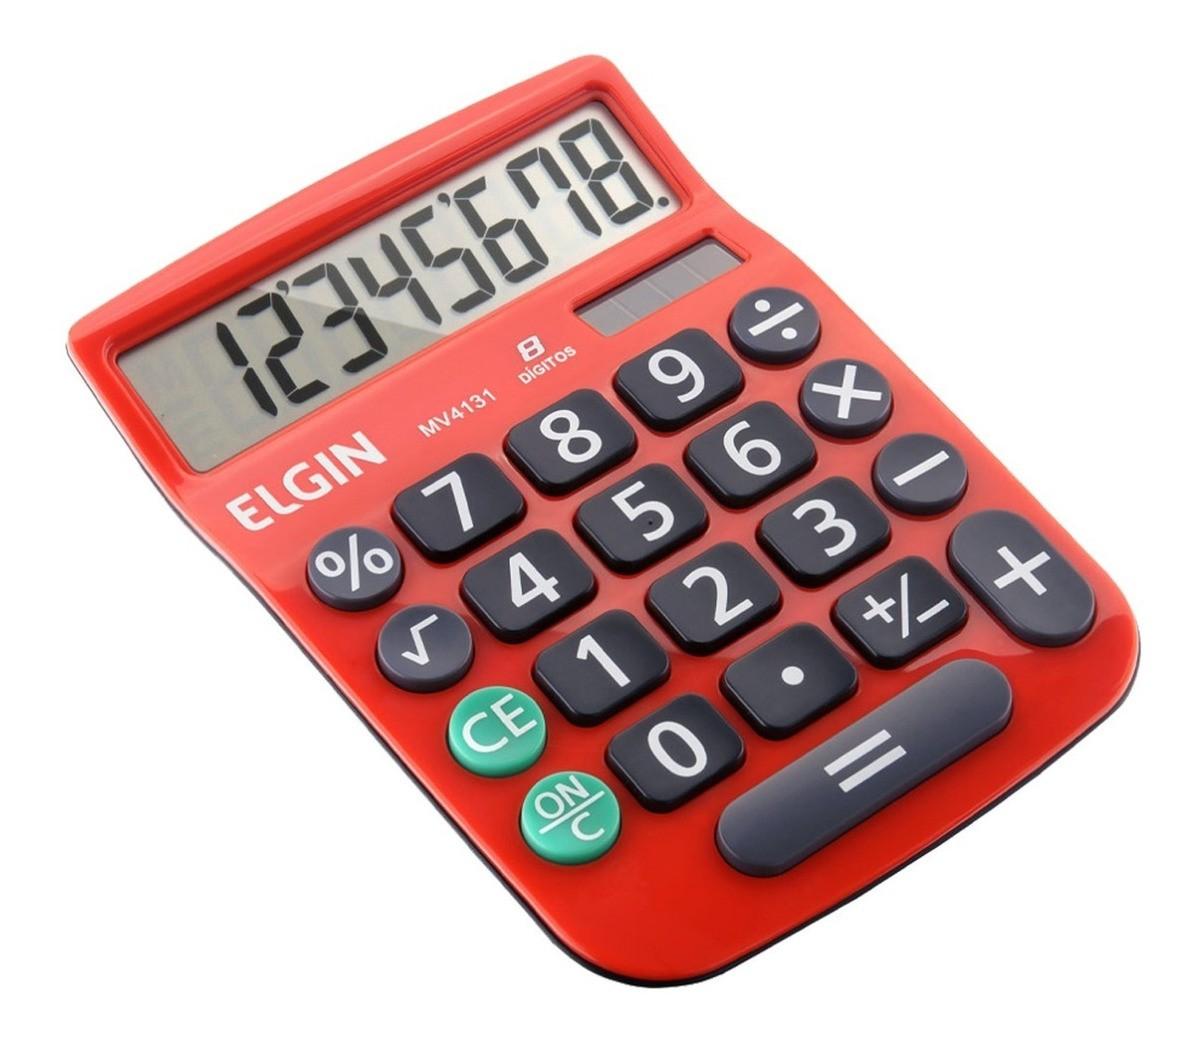 Calculadora Mesa Comercial Escritório 8 Dígitos Elgin Vermelha  - EMPORIO K